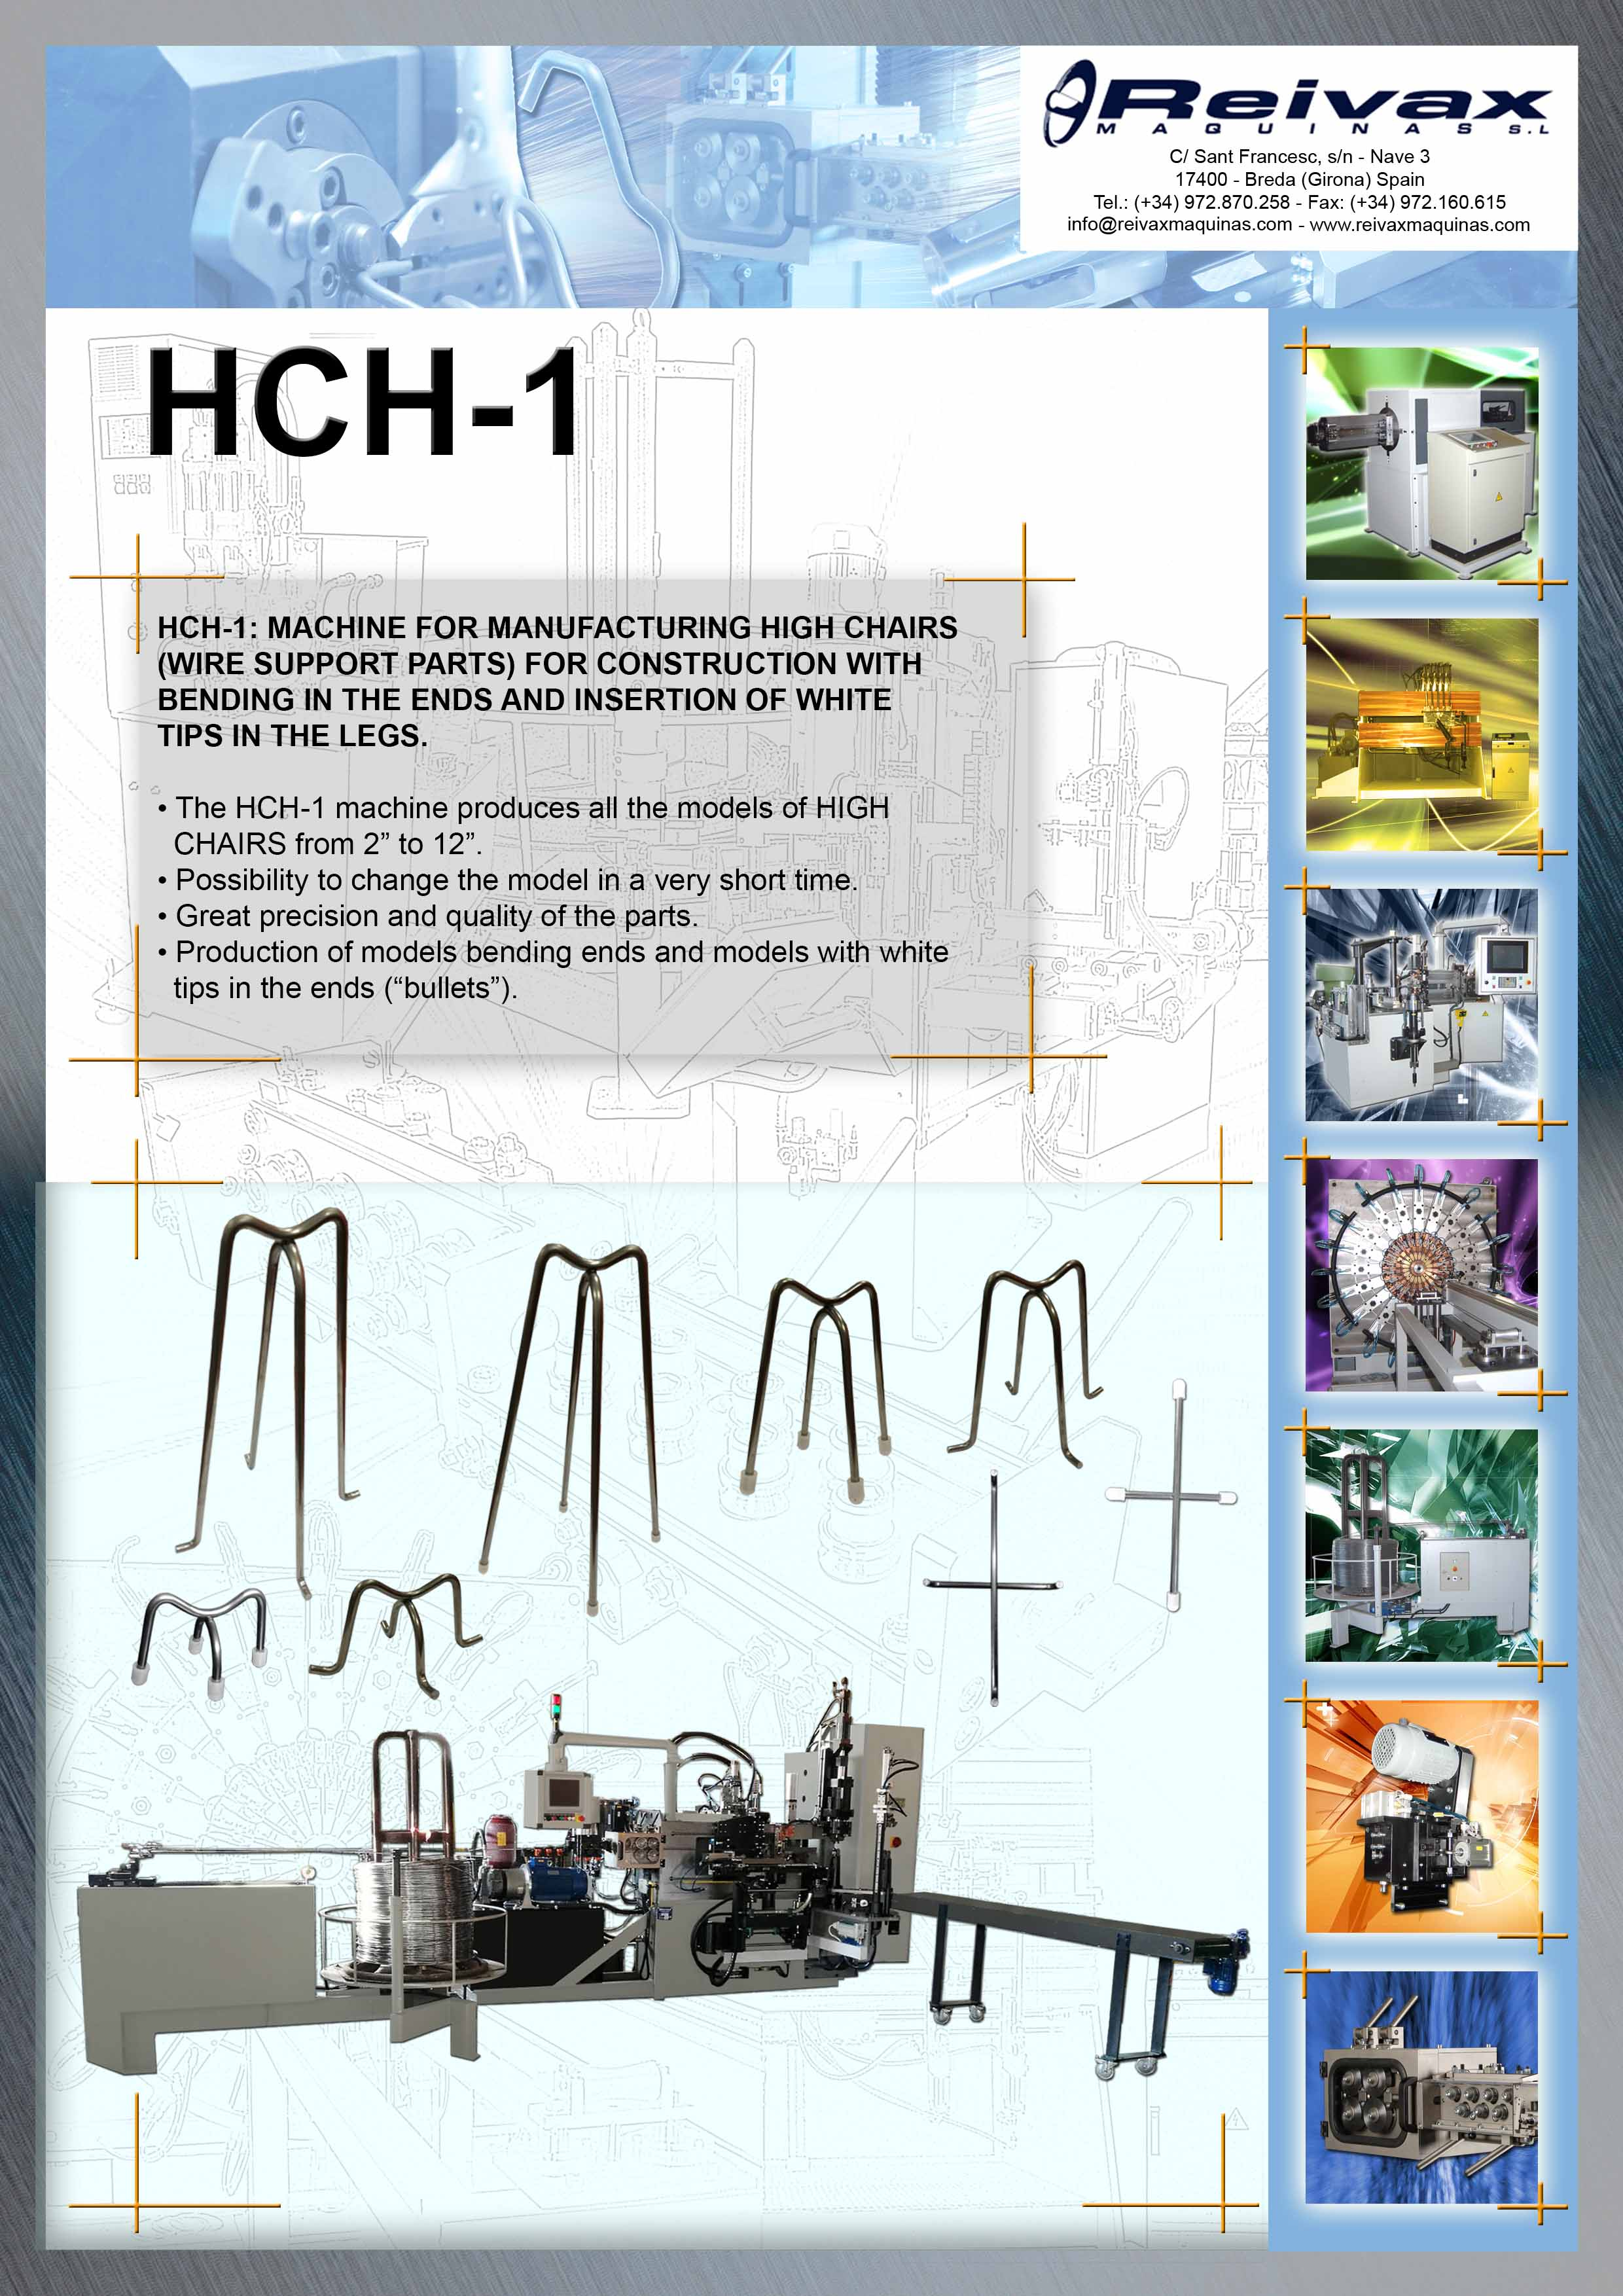 ReivaxMaquinas: Technical Details HCH-1